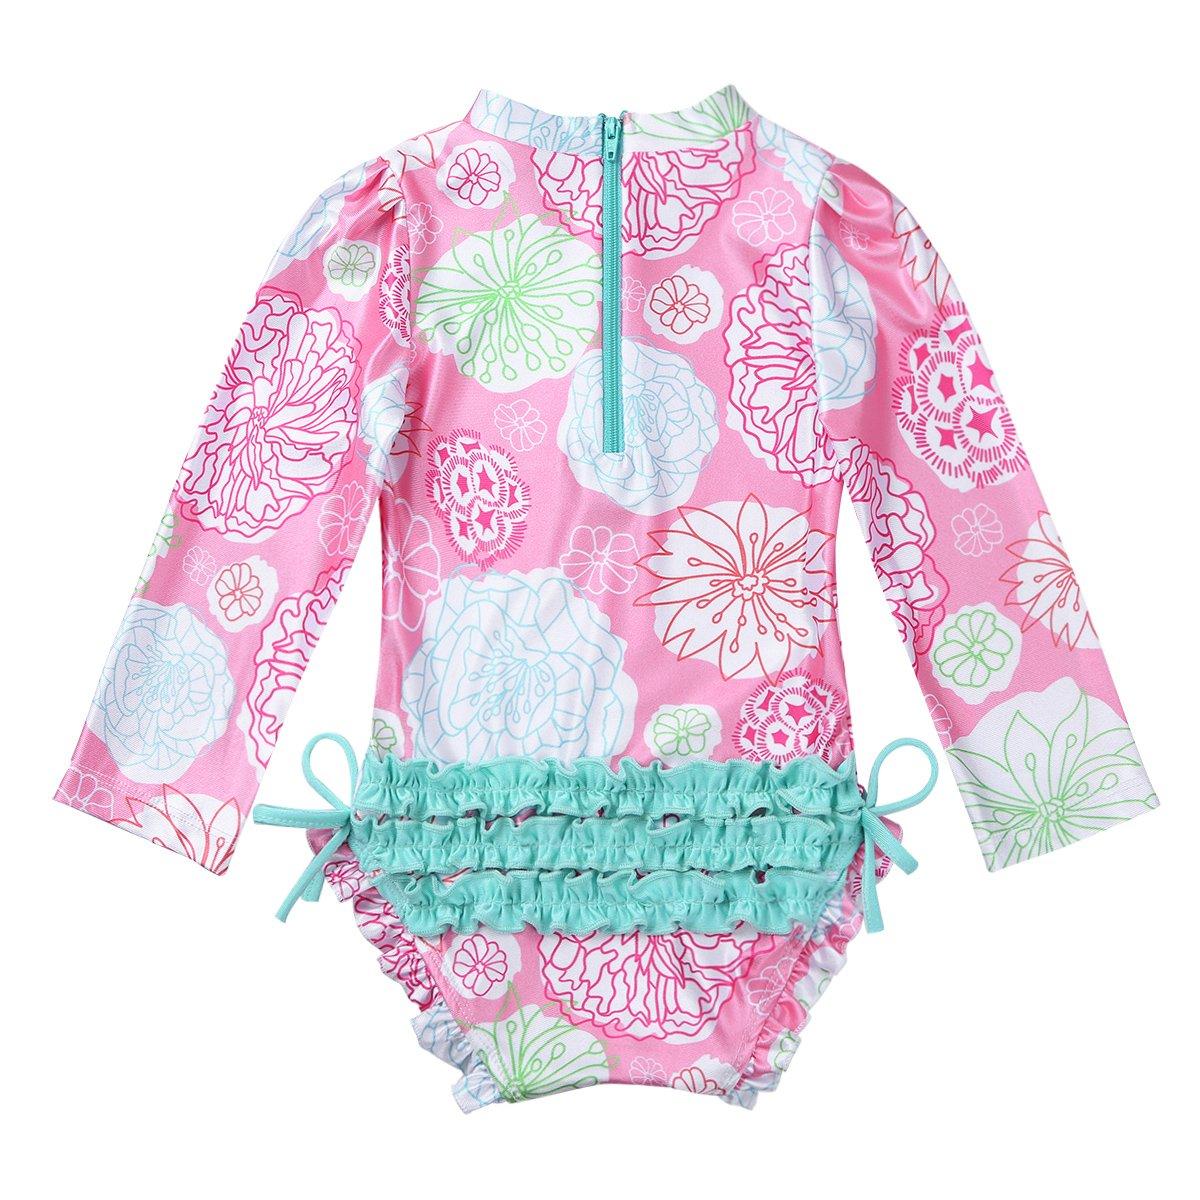 CHICTRY Toddler Little Girls One-Piece Ruffled Bottoms Flowers Long Sleeve Swimsuit Rash Guard Shirt